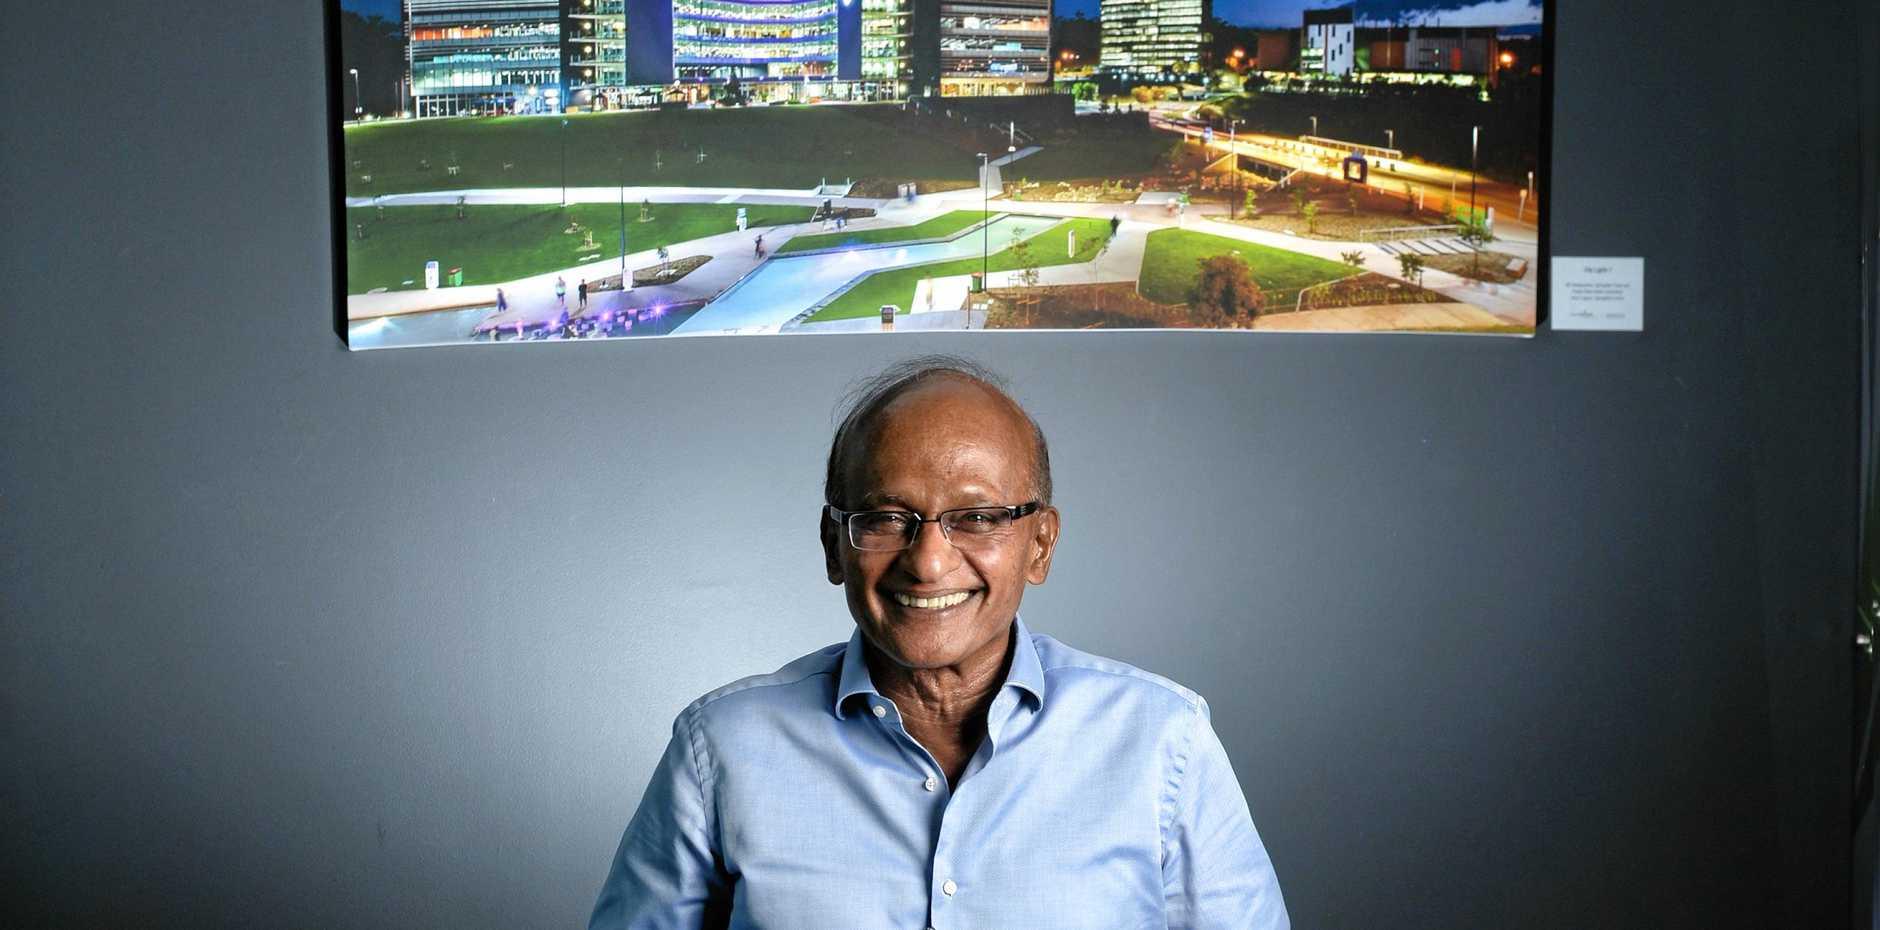 RICHLIST: Greater Springfield chairman Maha Sinnathamby is 39th on the rich list.